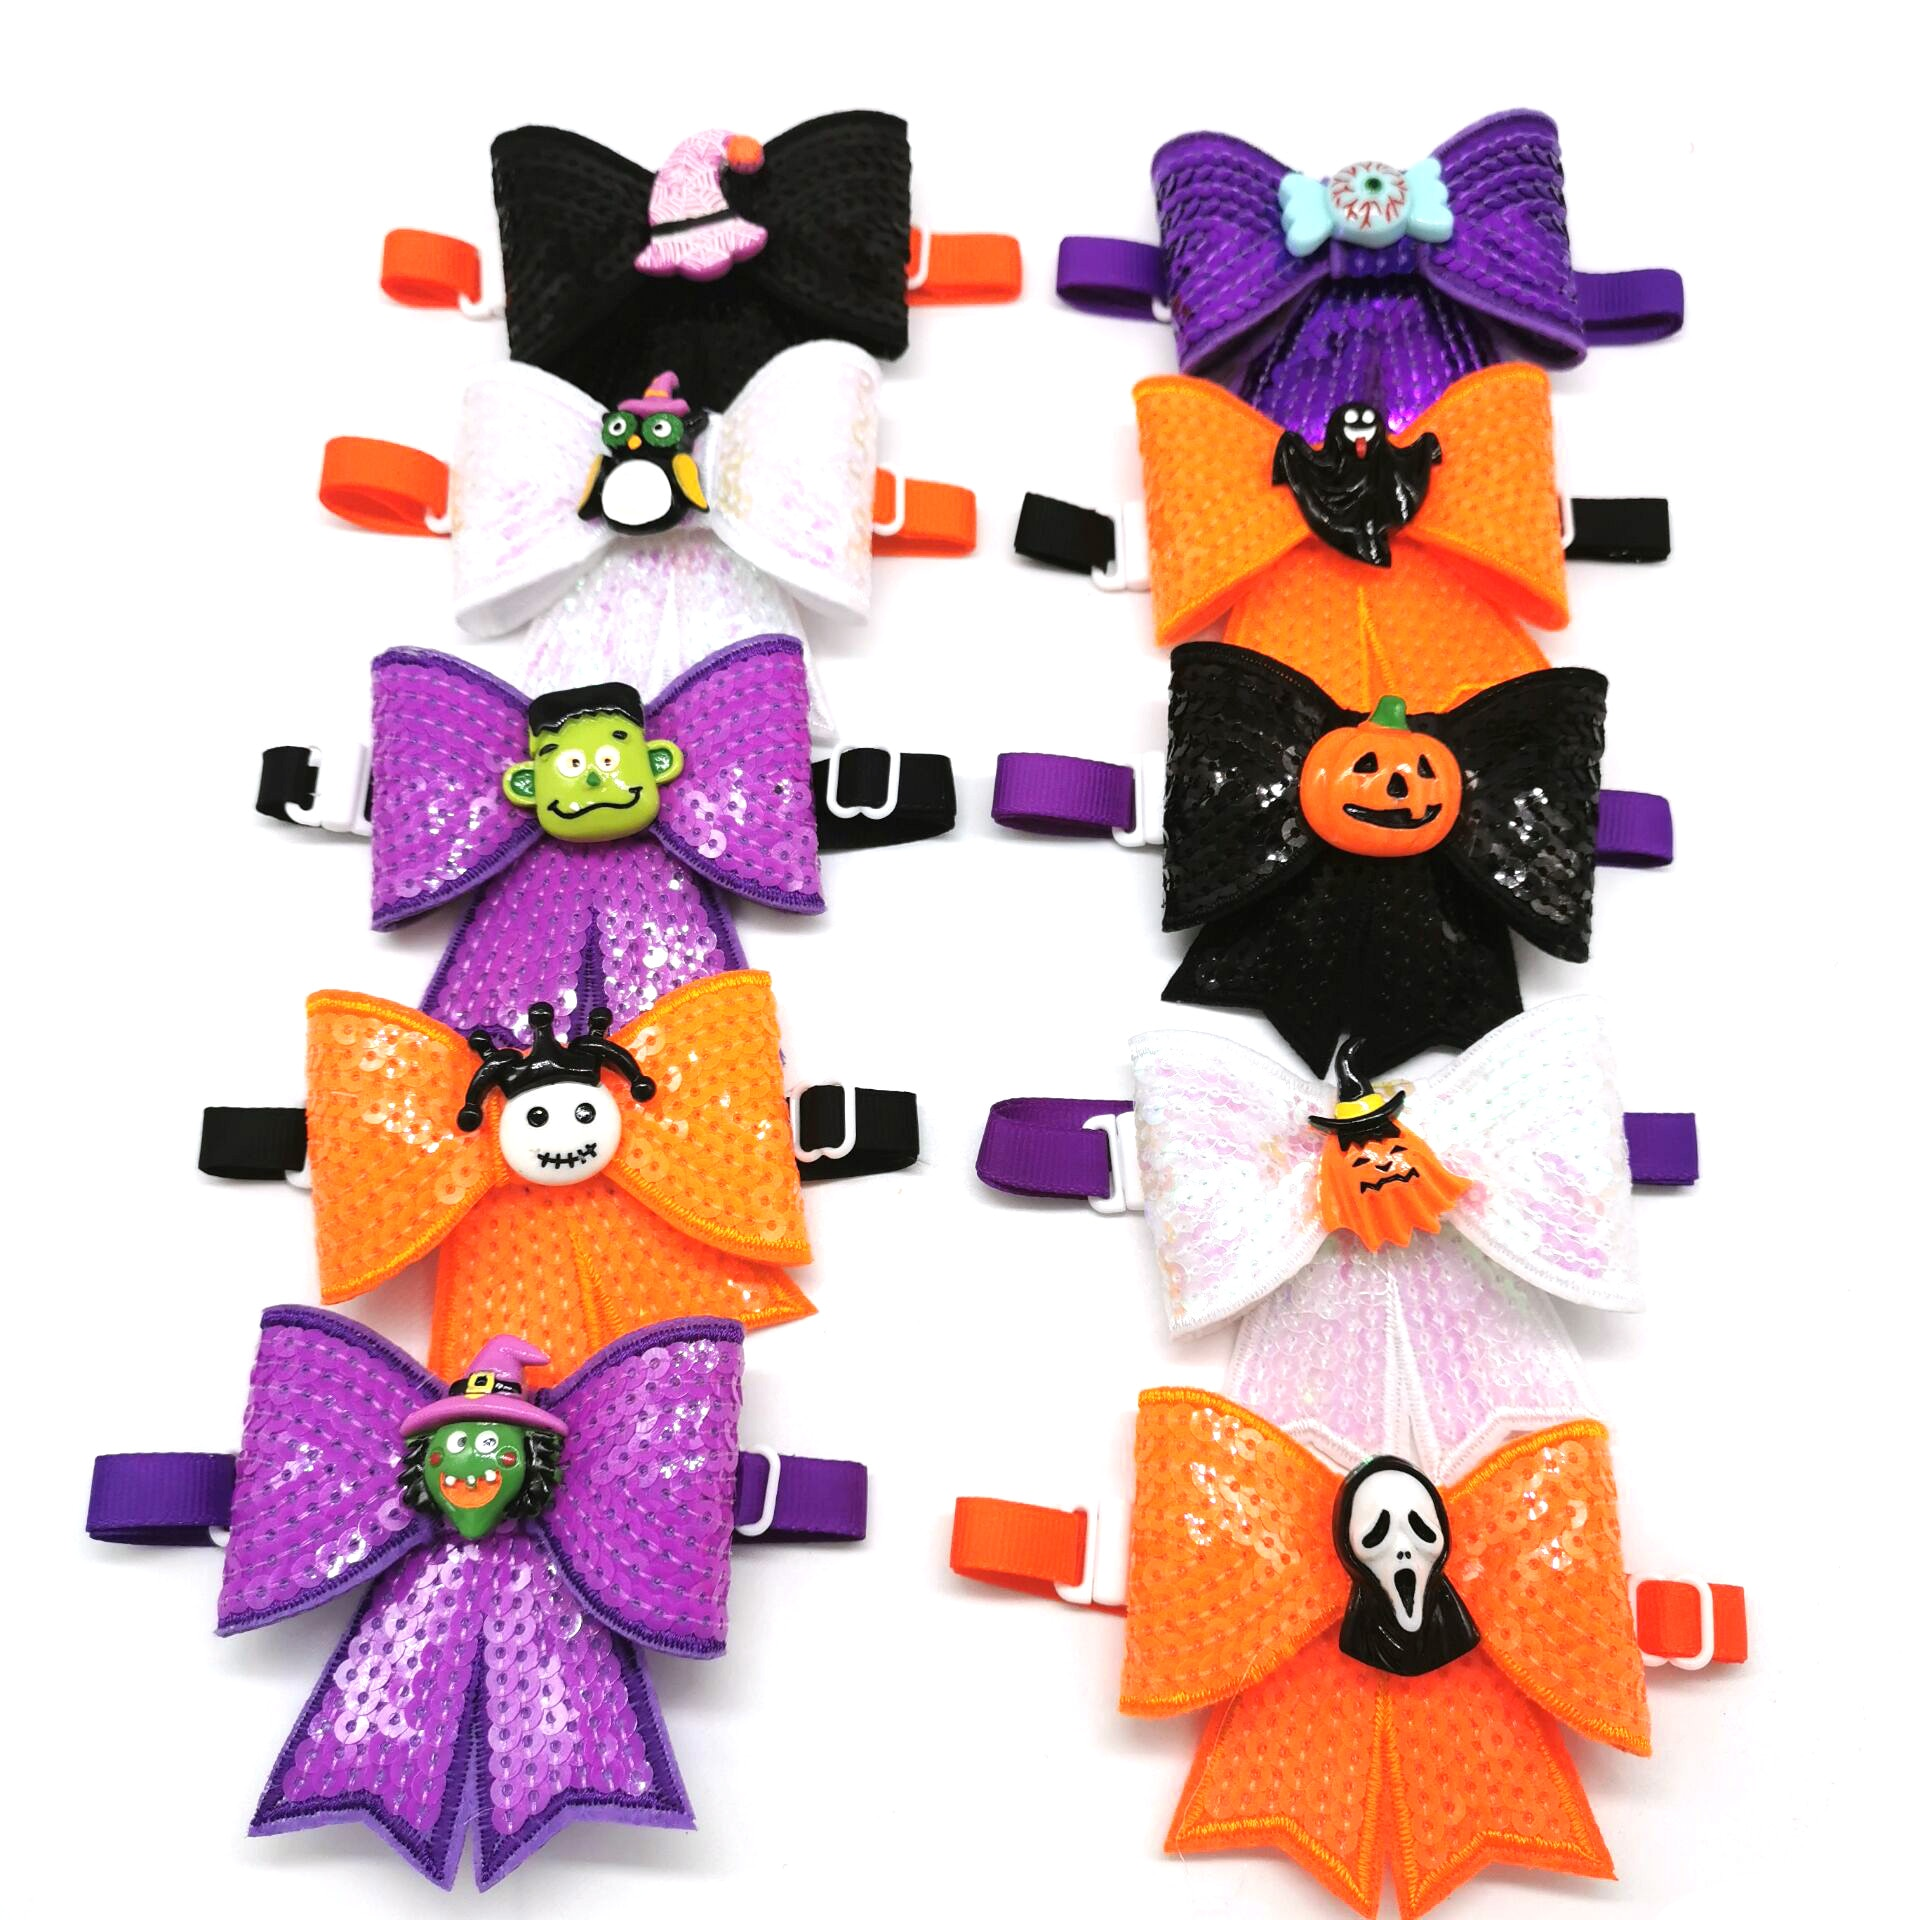 30-50pcs-halloween-pet-dog-cat-sequins-bowties-skull-pumpkin-eyes-style-puppy-dog-bowties-party-accessories-holiday-pet-supplies